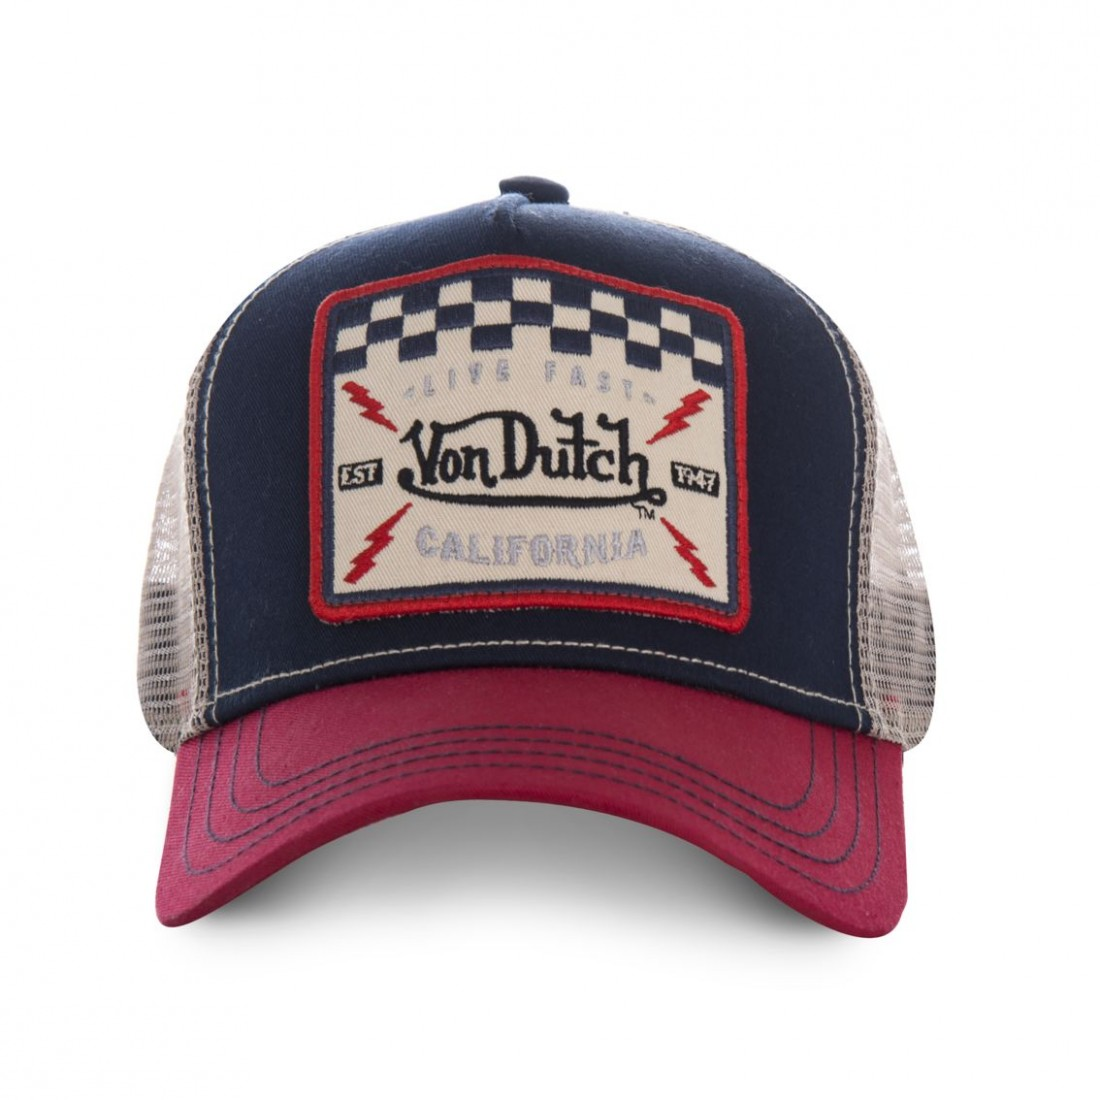 ab6a71d8eb353 Von Dutch Trucker Checkered Flag  casquette-homme-von-dutch-square-bleu-et-rouge (